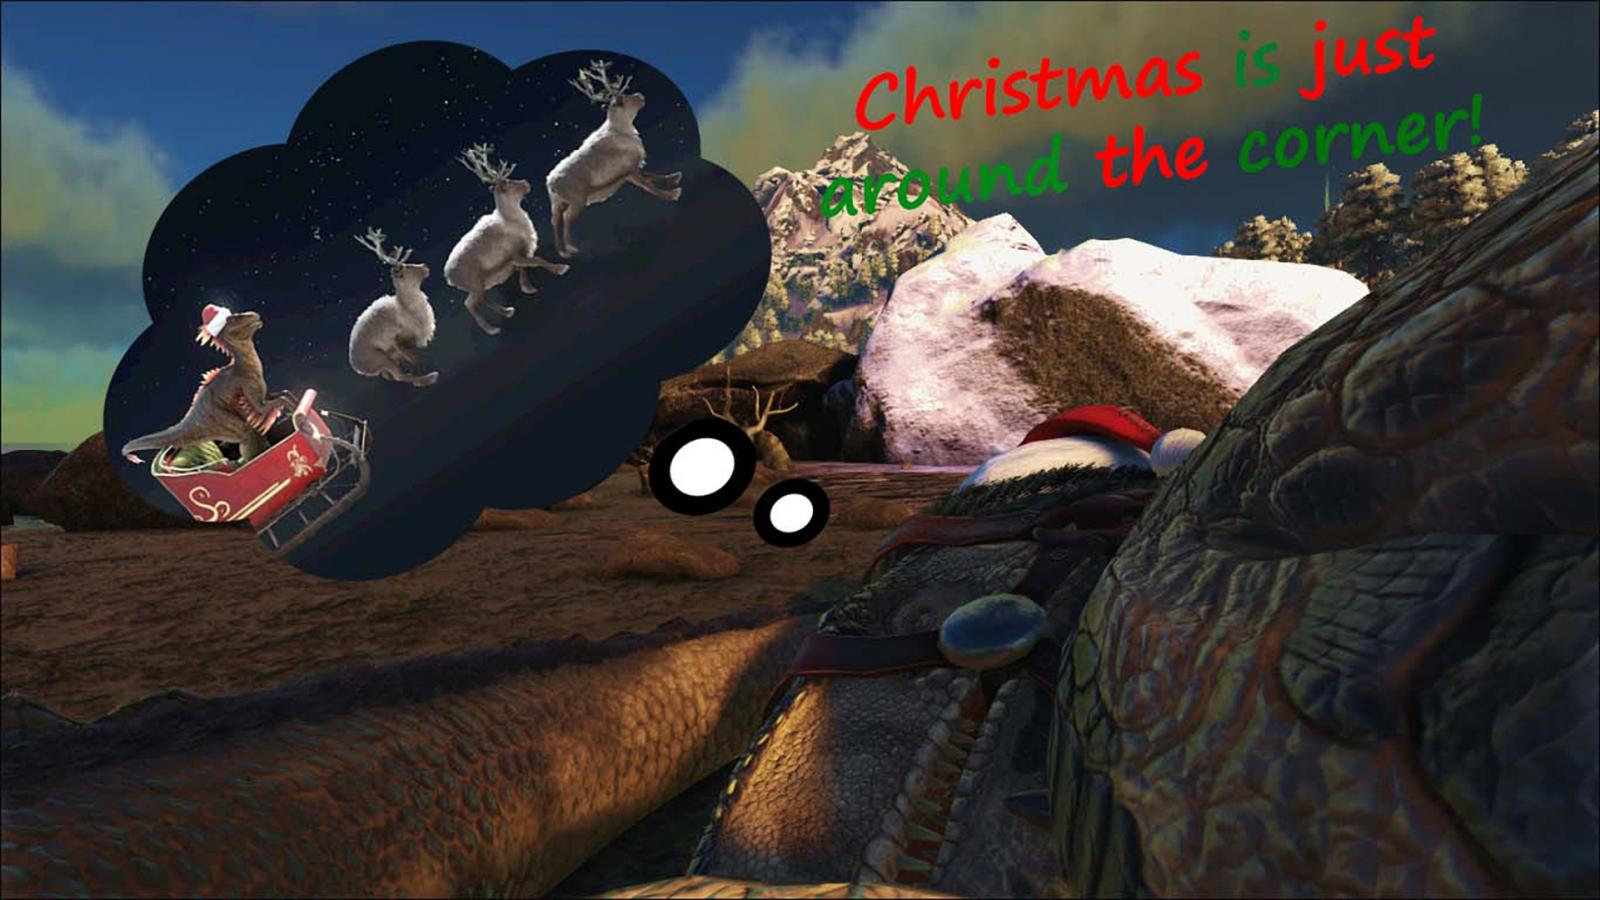 large.5a0fb6fa5b263_JoeLally-ChristmasDreams.jpg